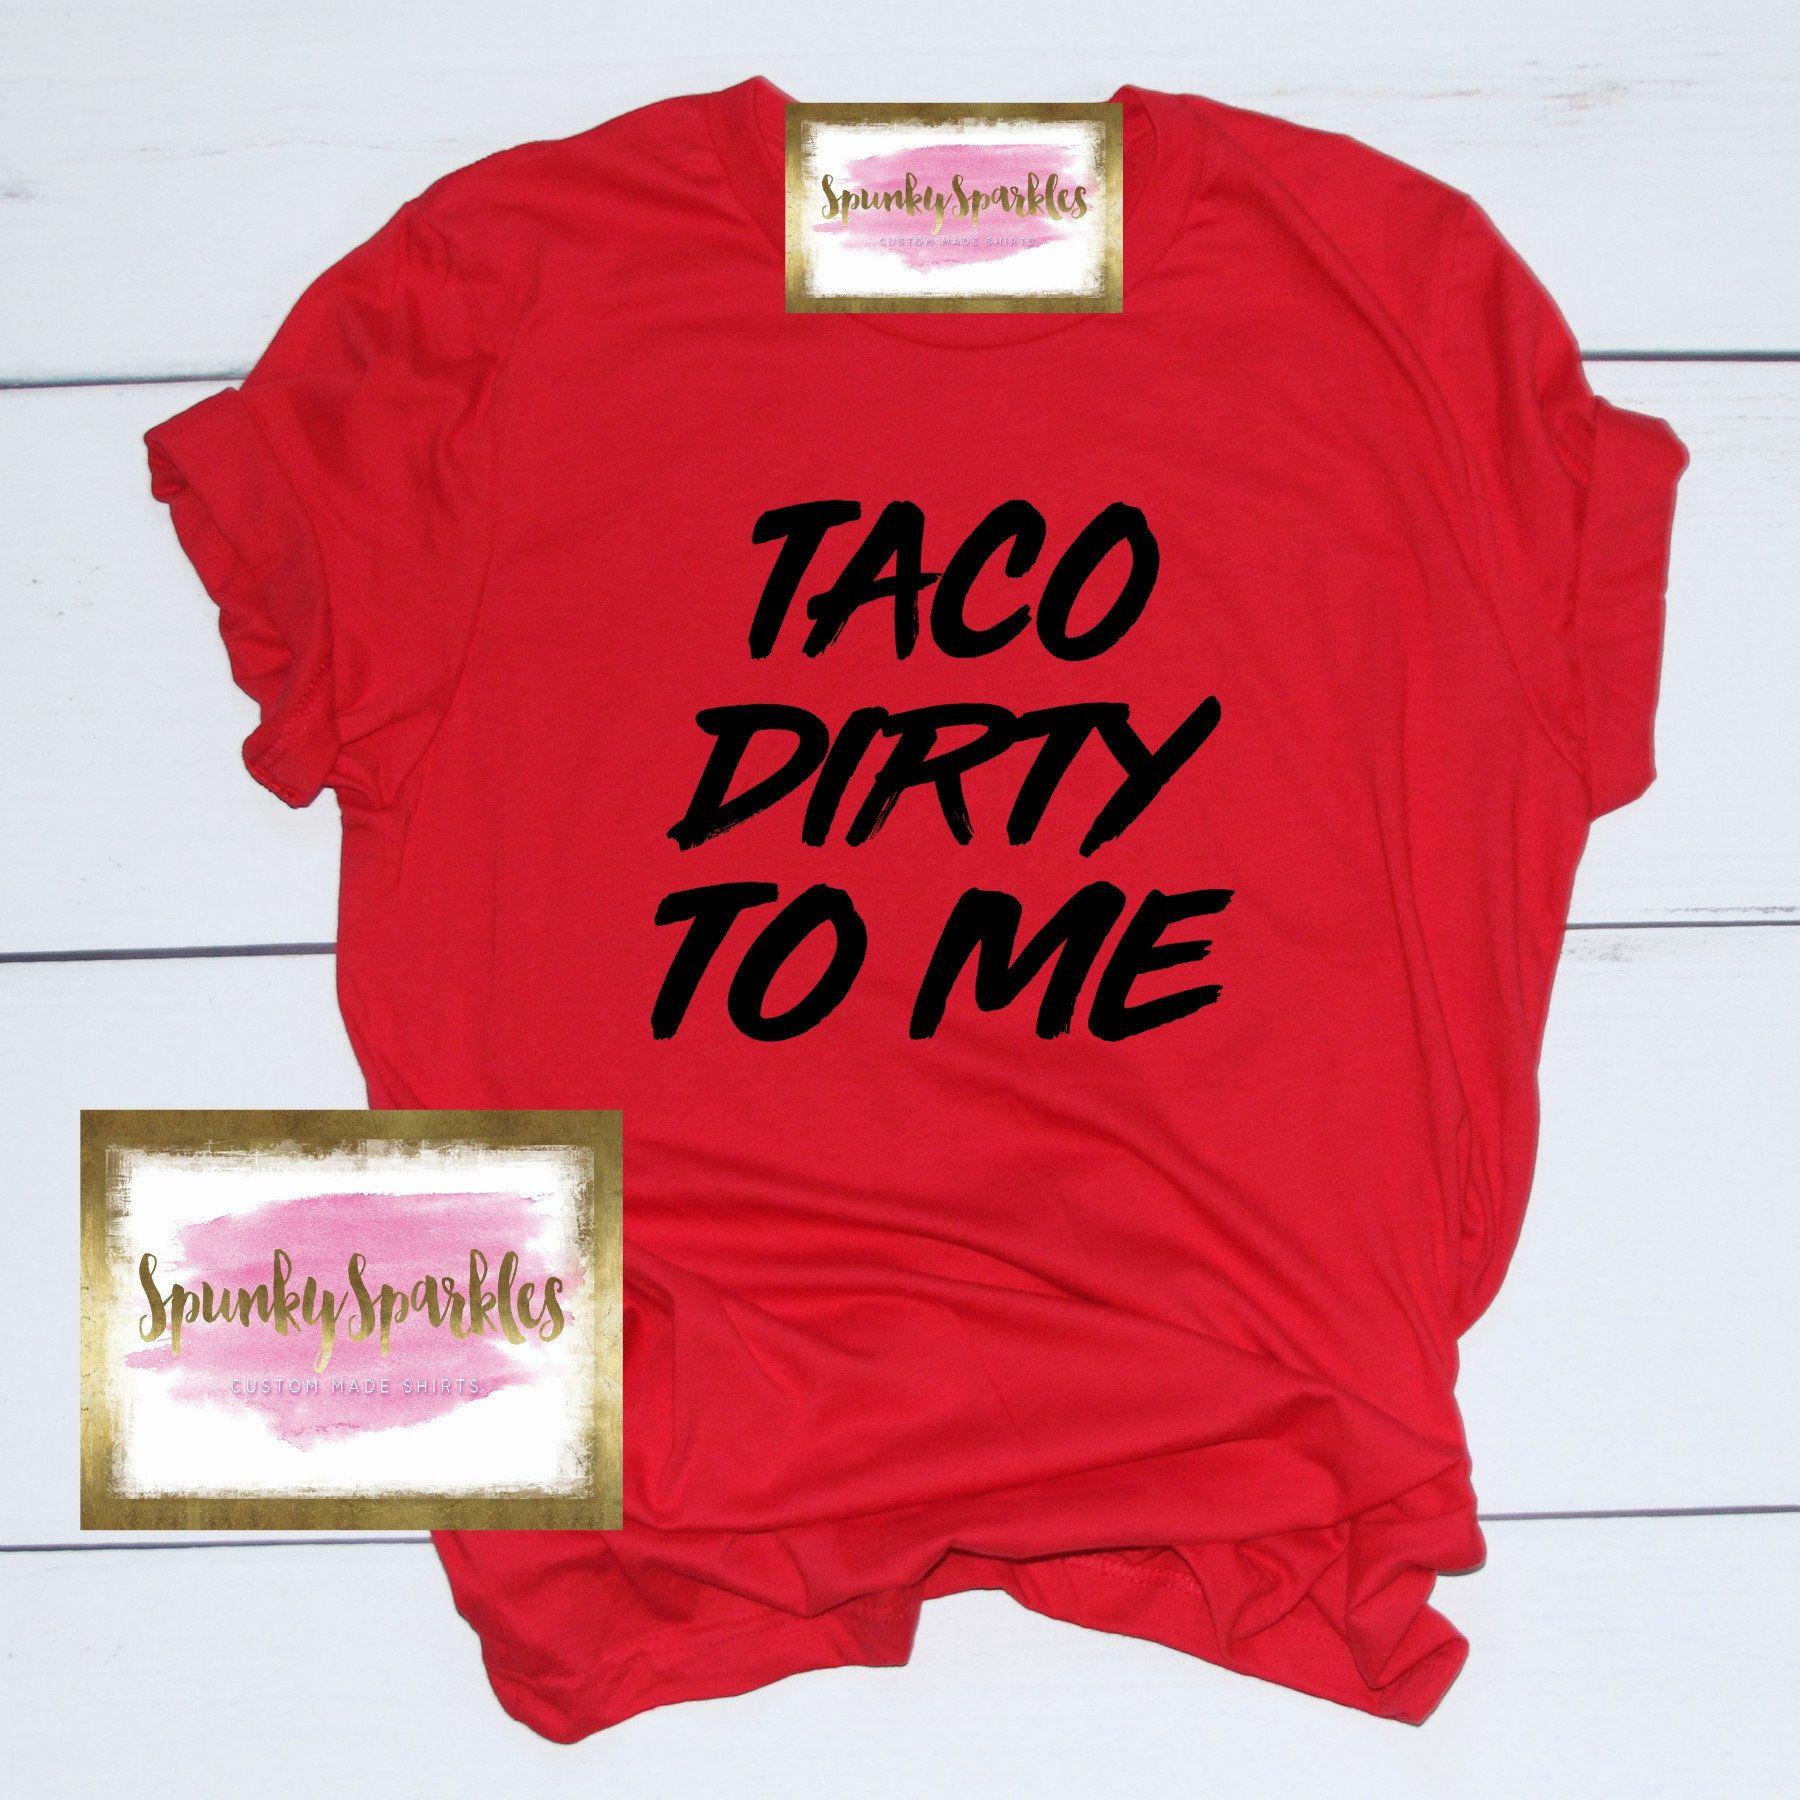 fae0e1c40 Taco Dirty To Me Shirt, Taco Shirt, Taco Tuesday, Tacos, Funny Women's Shirt,  Taco T-Shirt, I Love Tacos, Taco About It, Tacos and Tequila by  SpunkySparkles ...